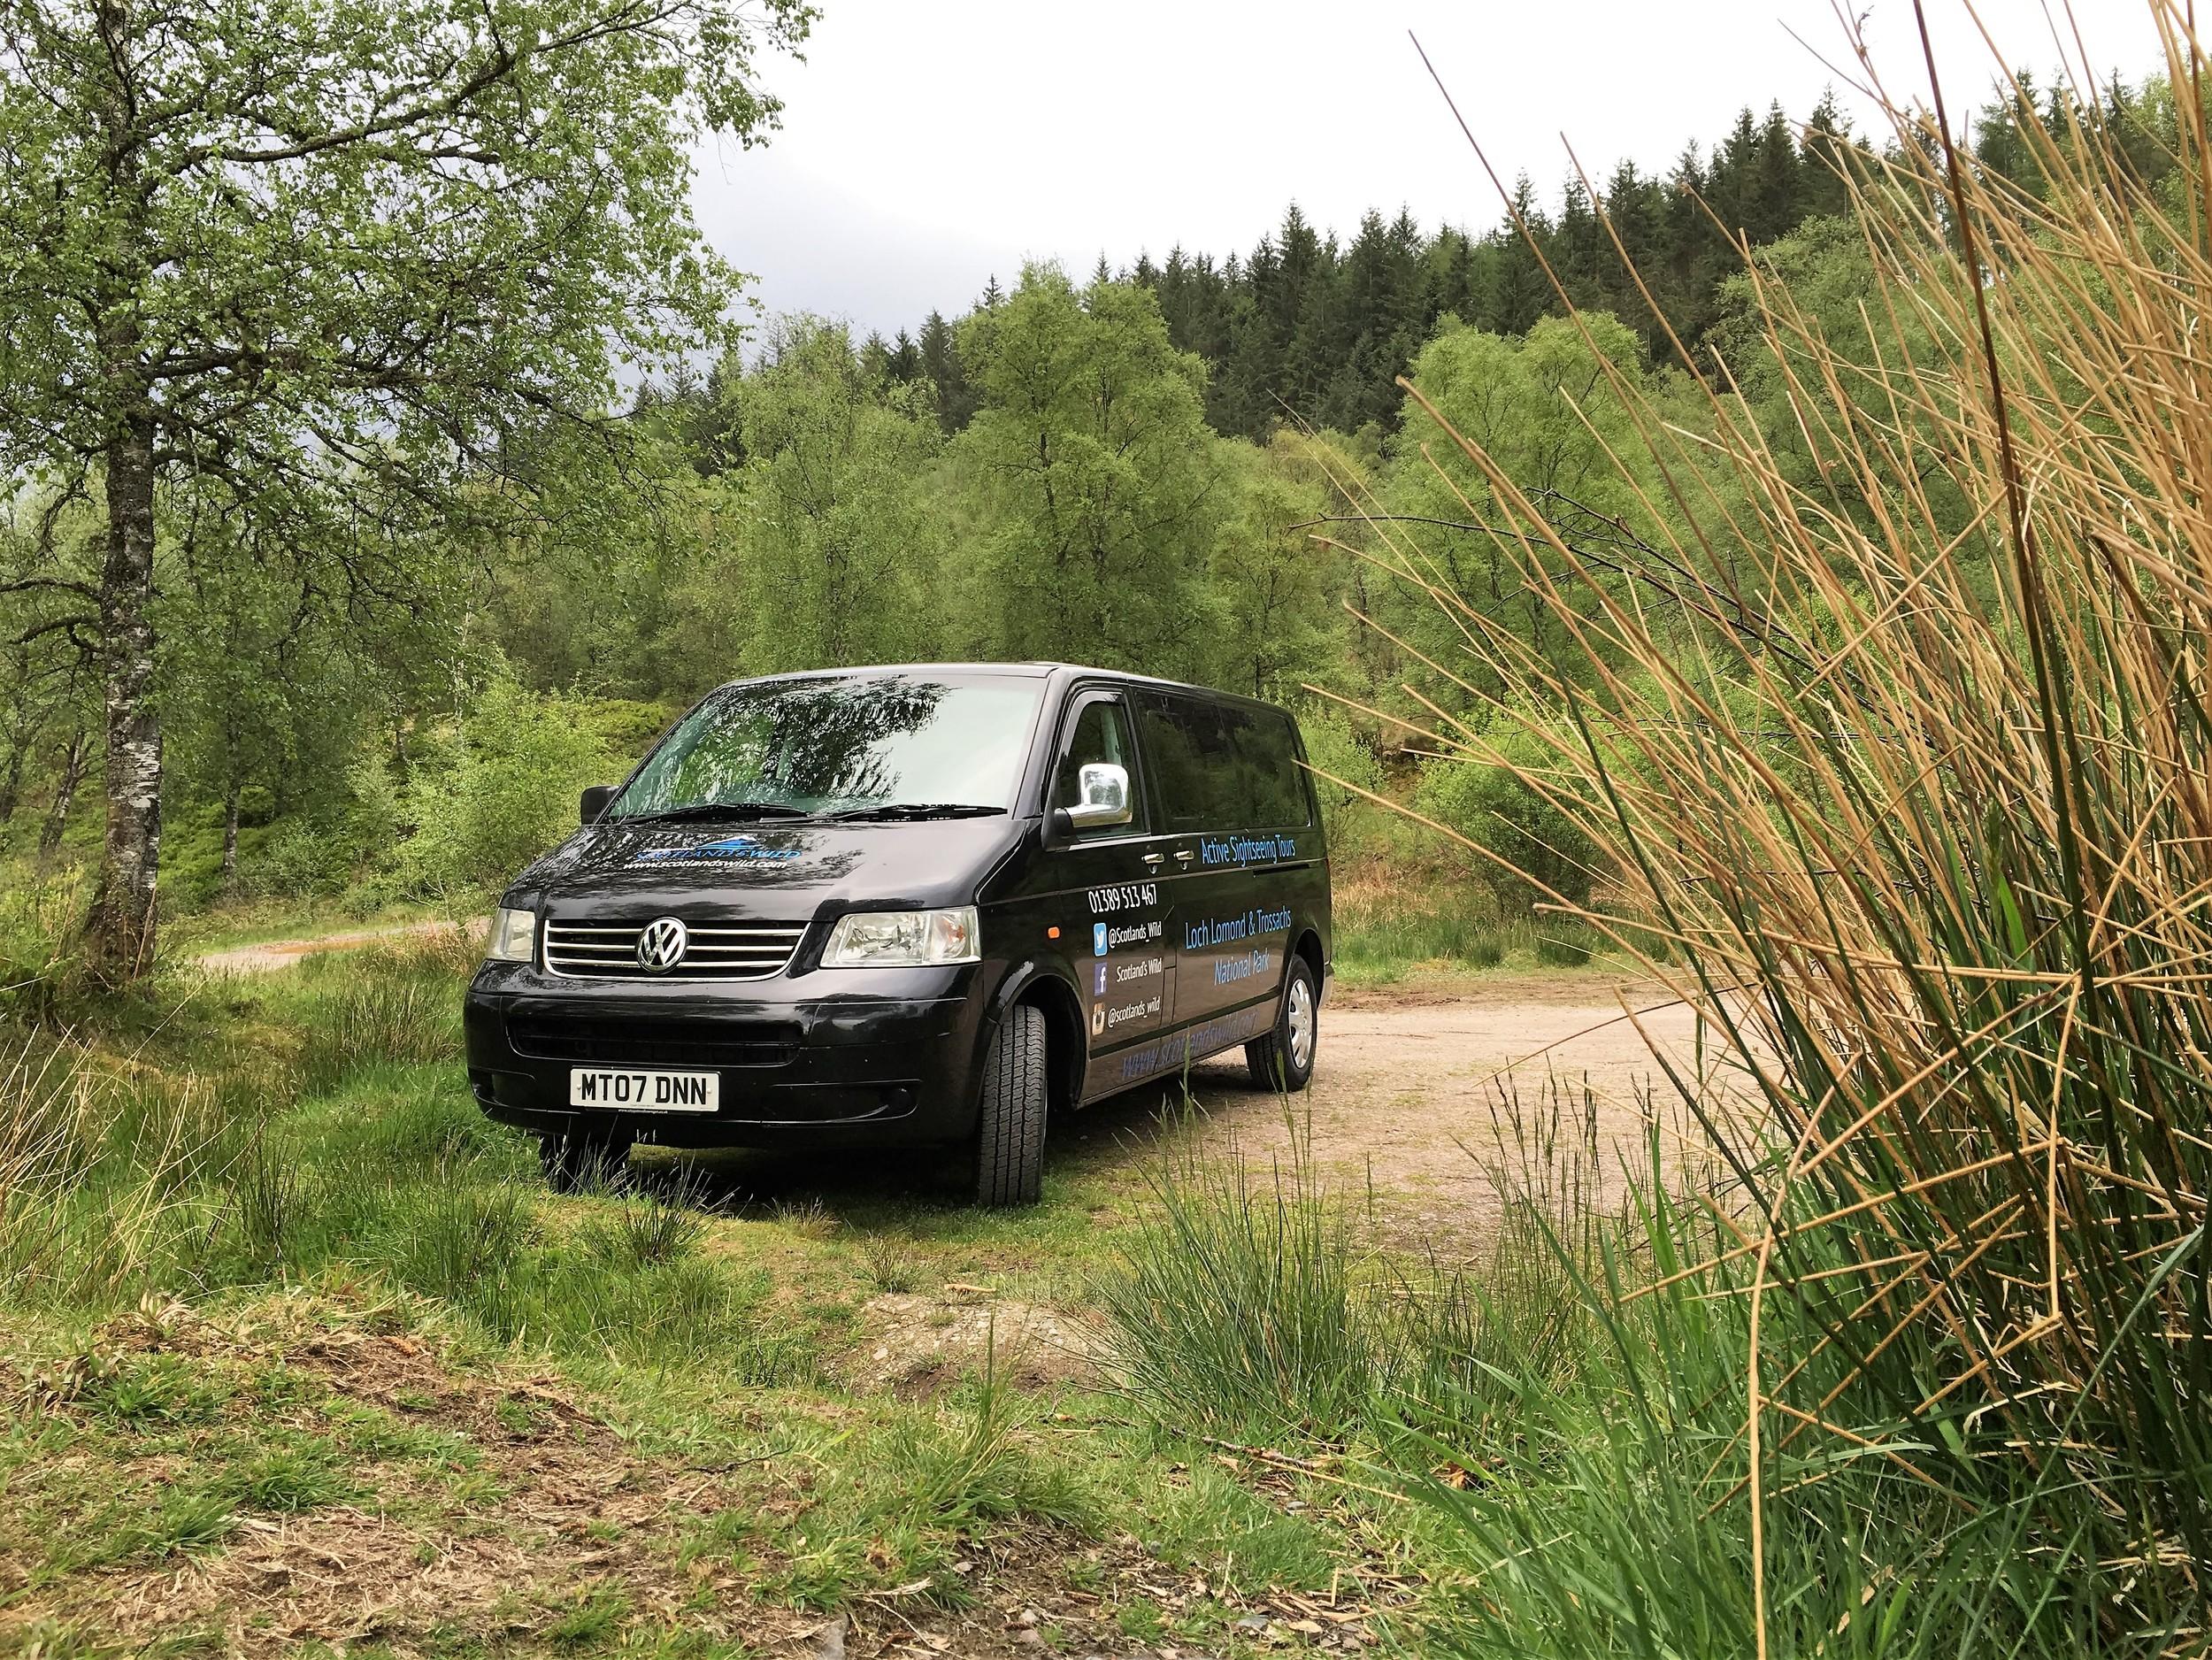 van in a scenic Scottish location